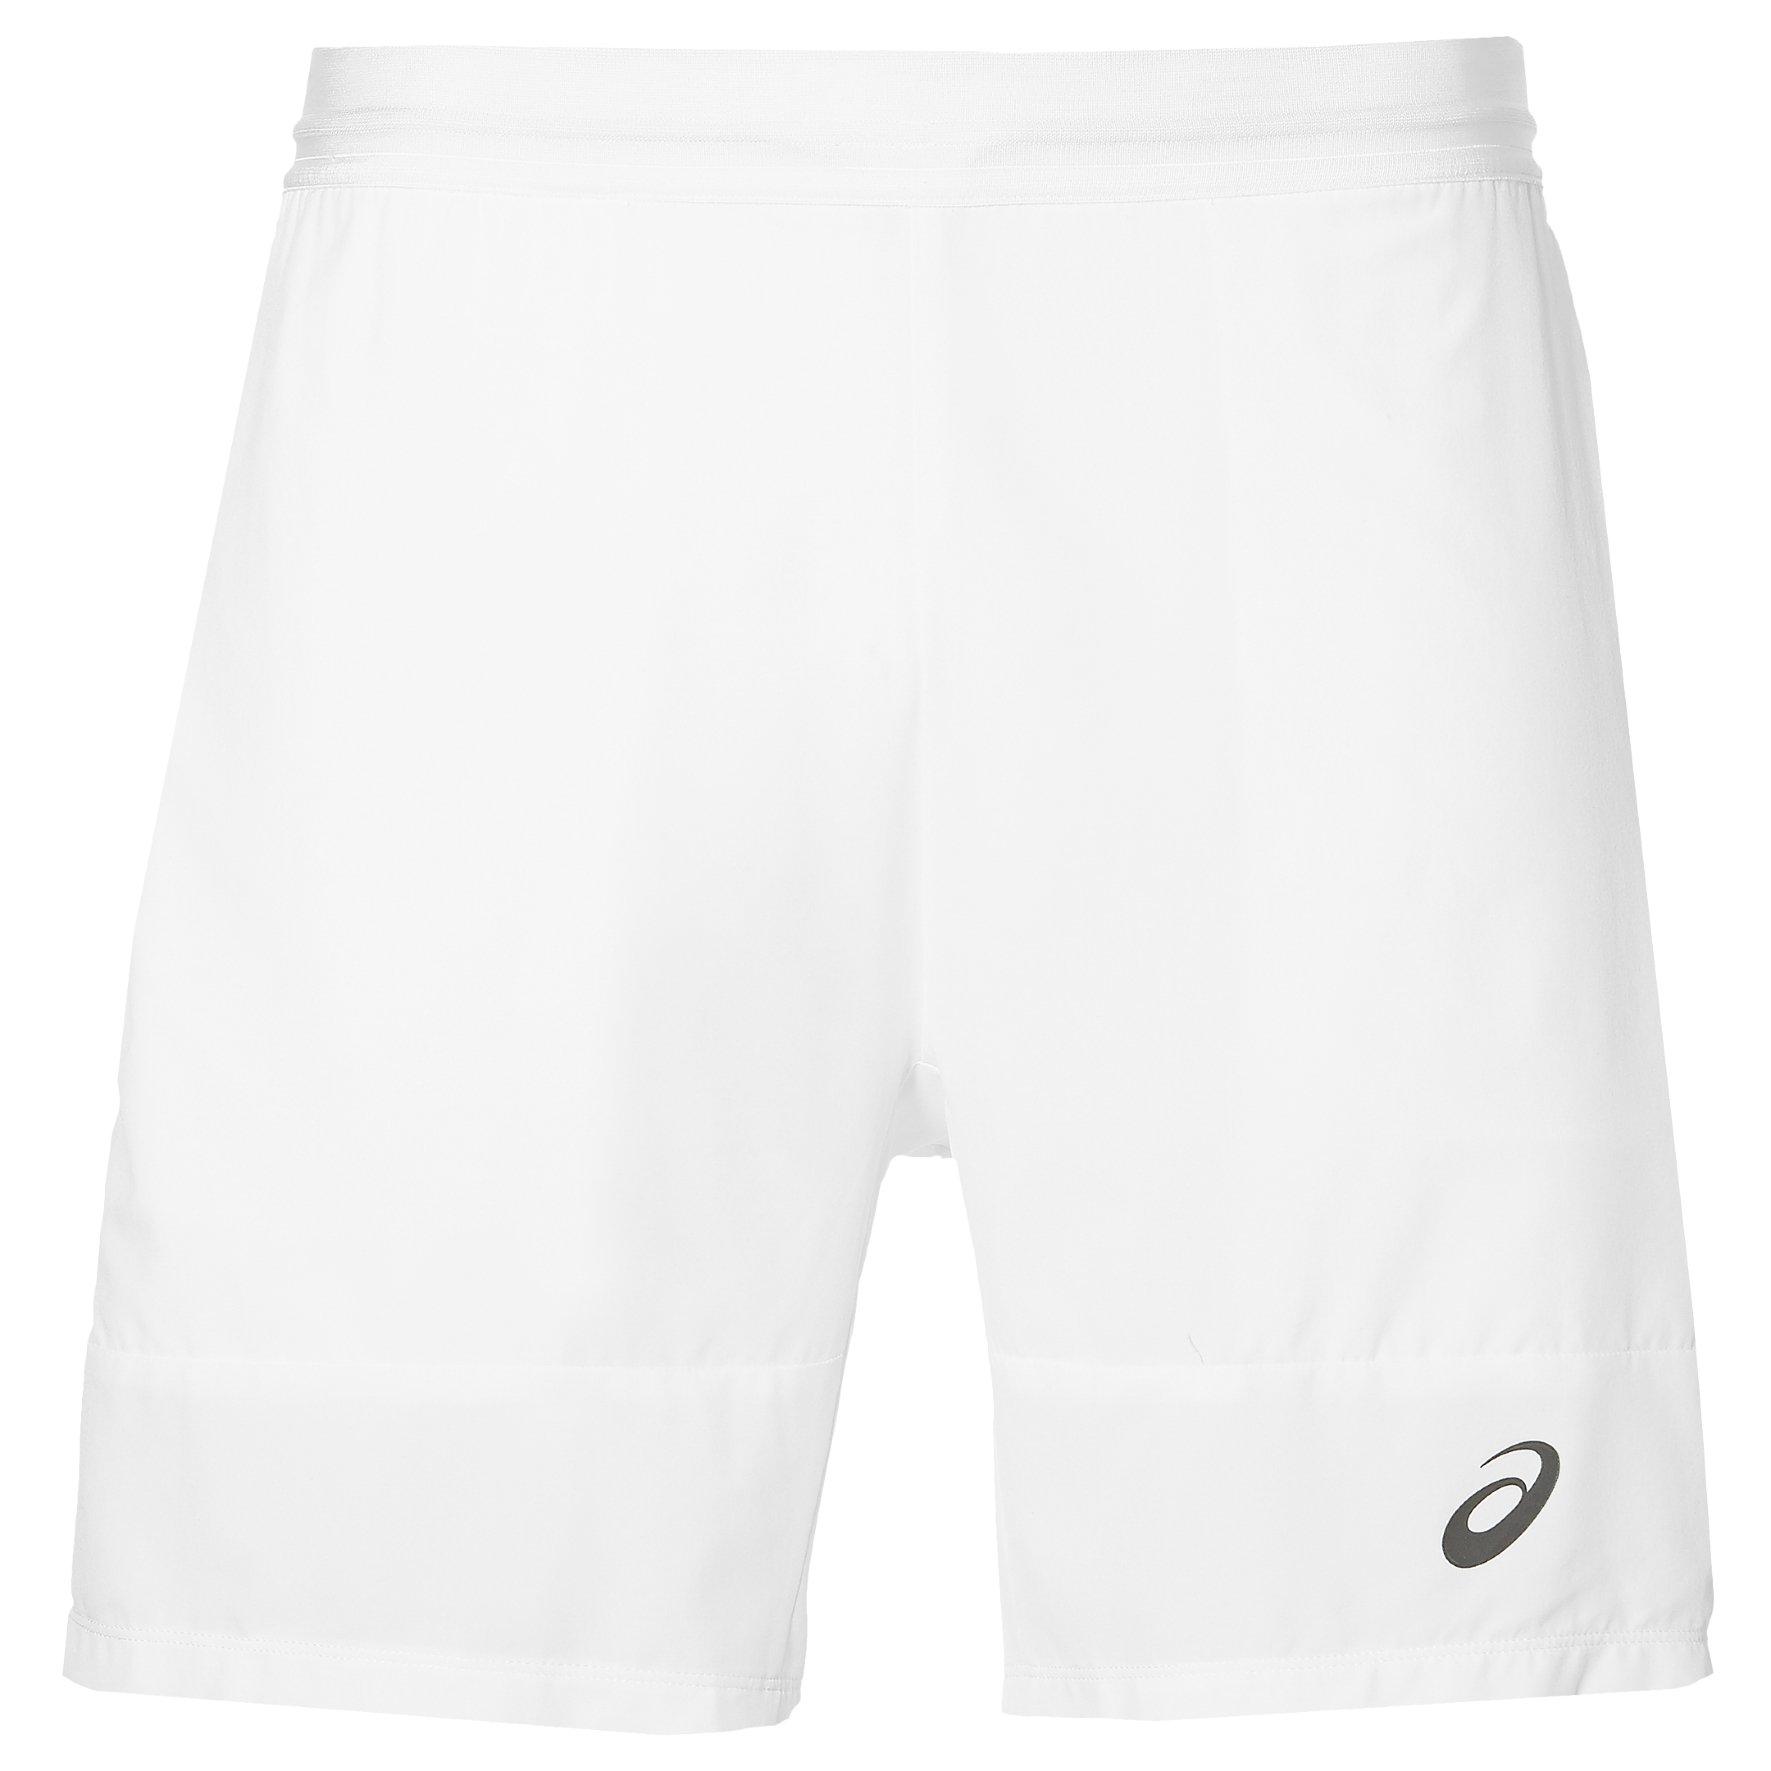 Asics Athlete 7 Inches Mens Tennis Shorts